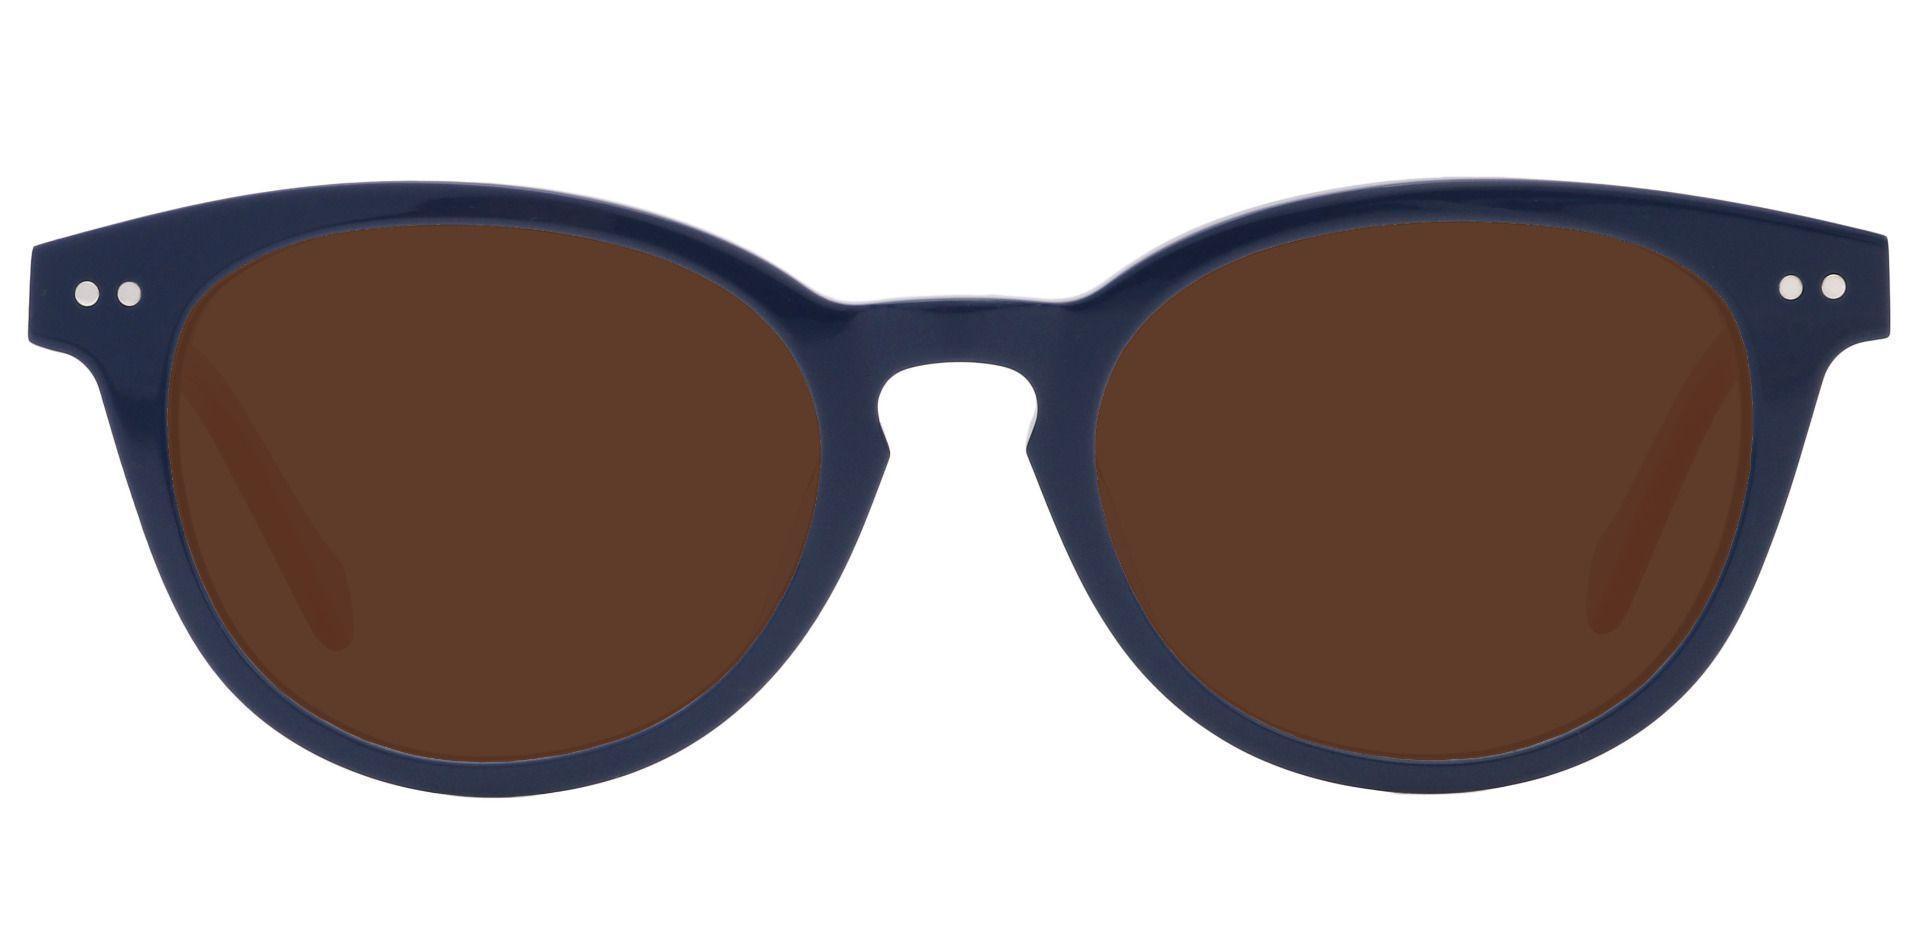 Common Oval Progressive Sunglasses - Blue Frame With Brown Lenses